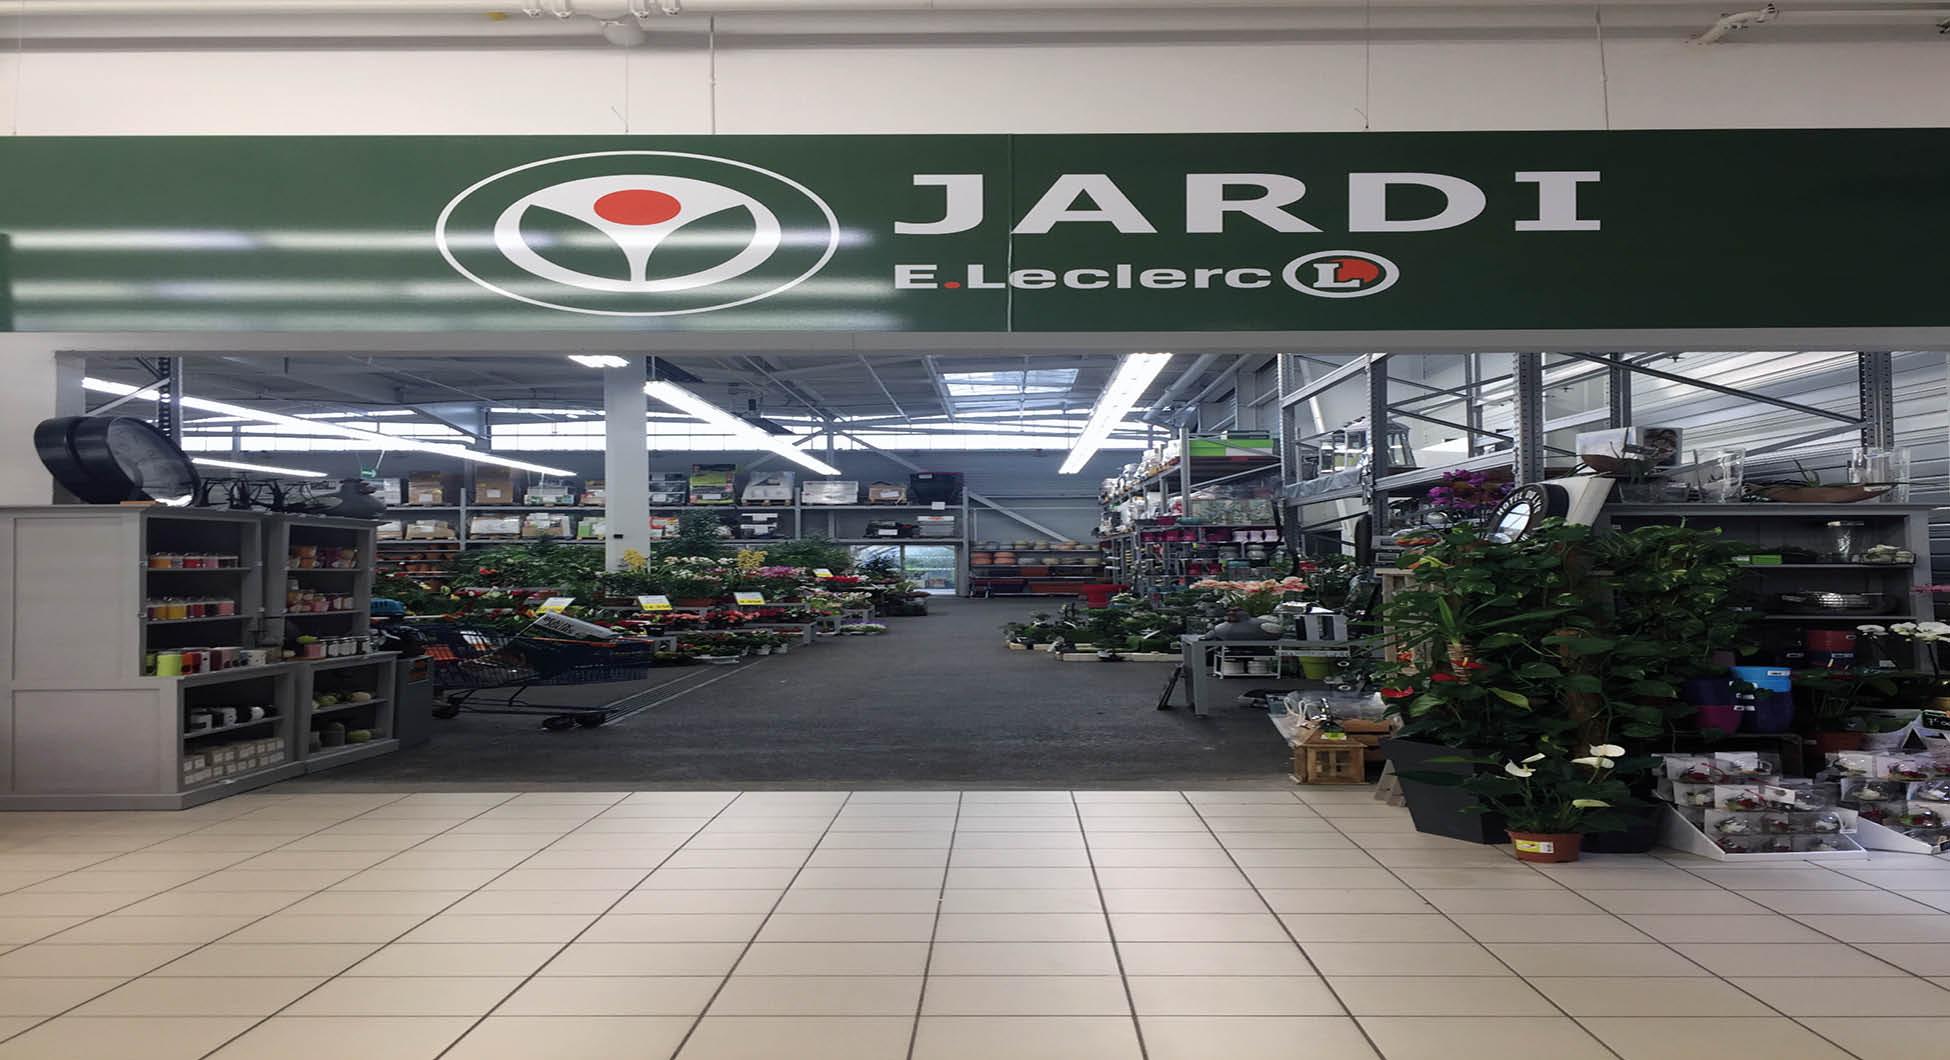 E.leclerc Rochefort Sur Mer - Rochefort - Jardi serapportantà Abris Jardin Leclerc